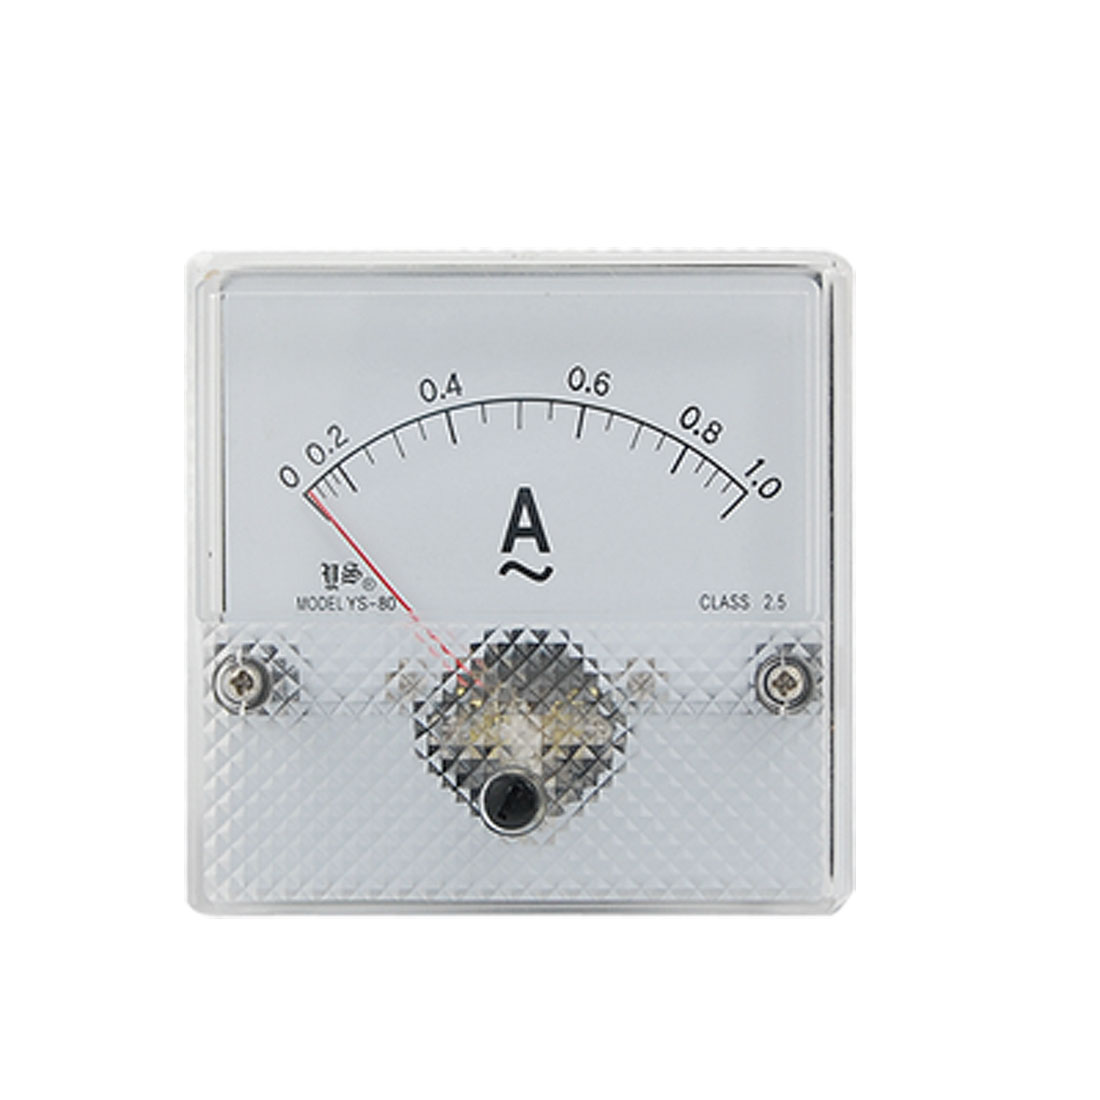 AC 0-1A Current Range Analog Panel Meter Ammeter YS-80